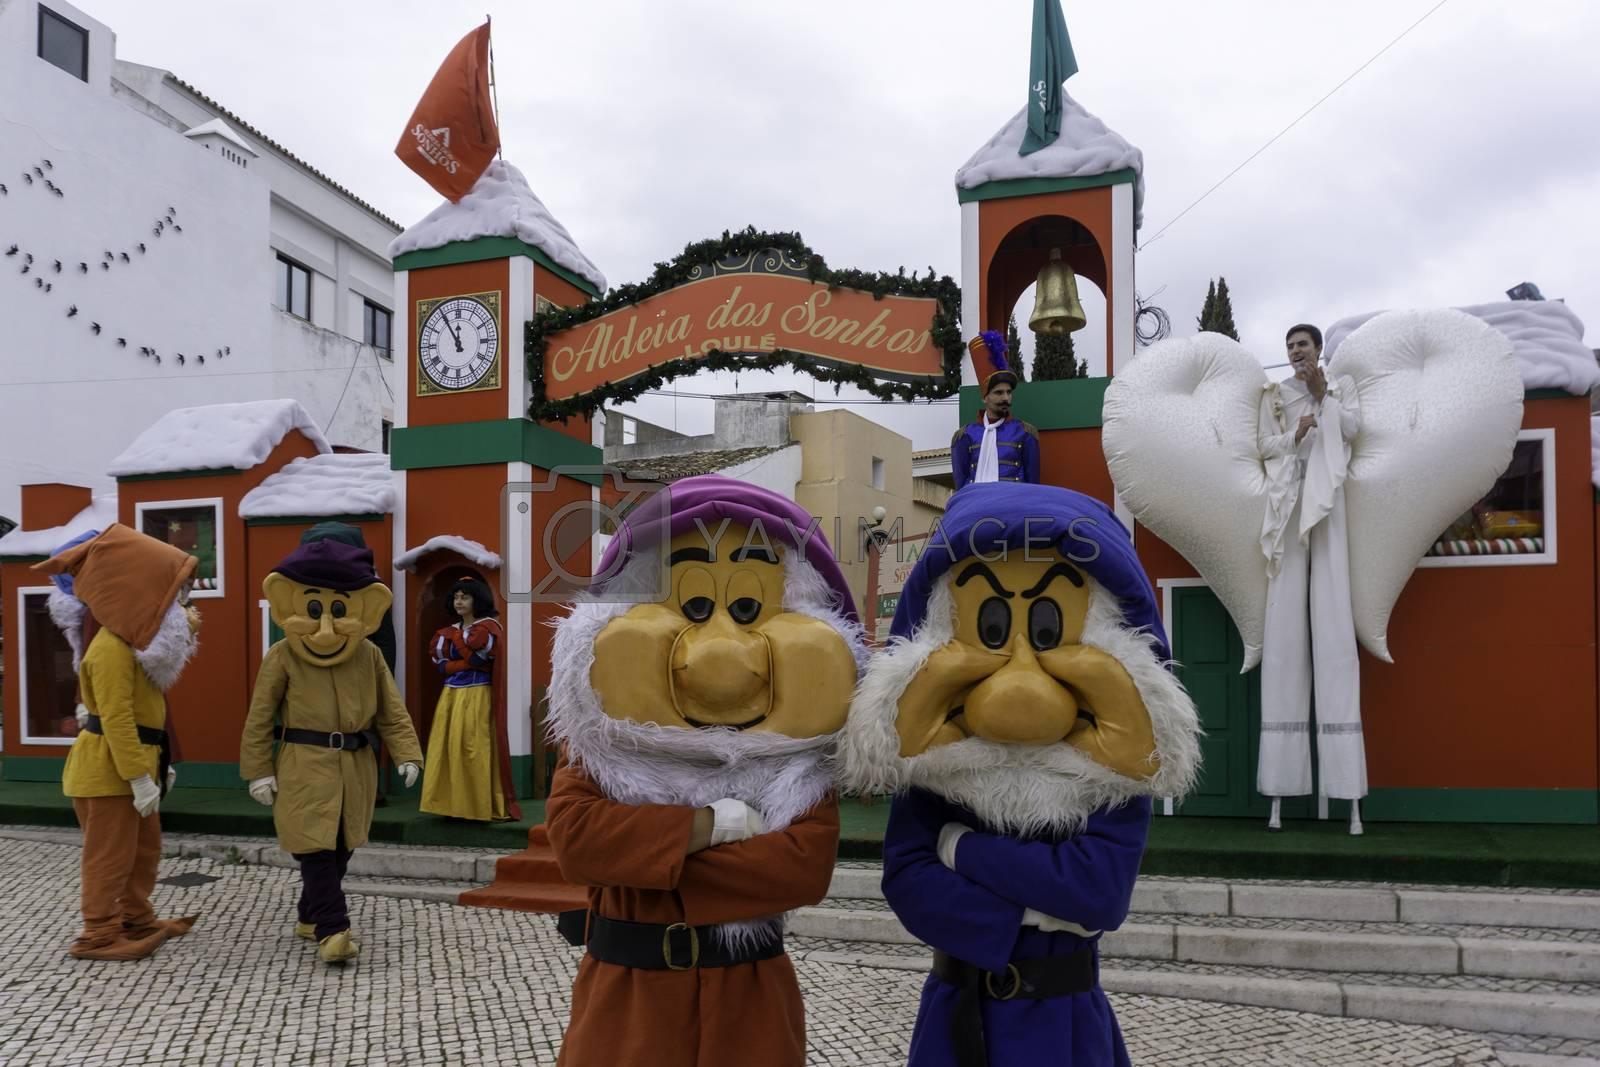 The. Aldeia dos Sonhos, the Village of Dreams part of the Christmas celebrations in Loulé.